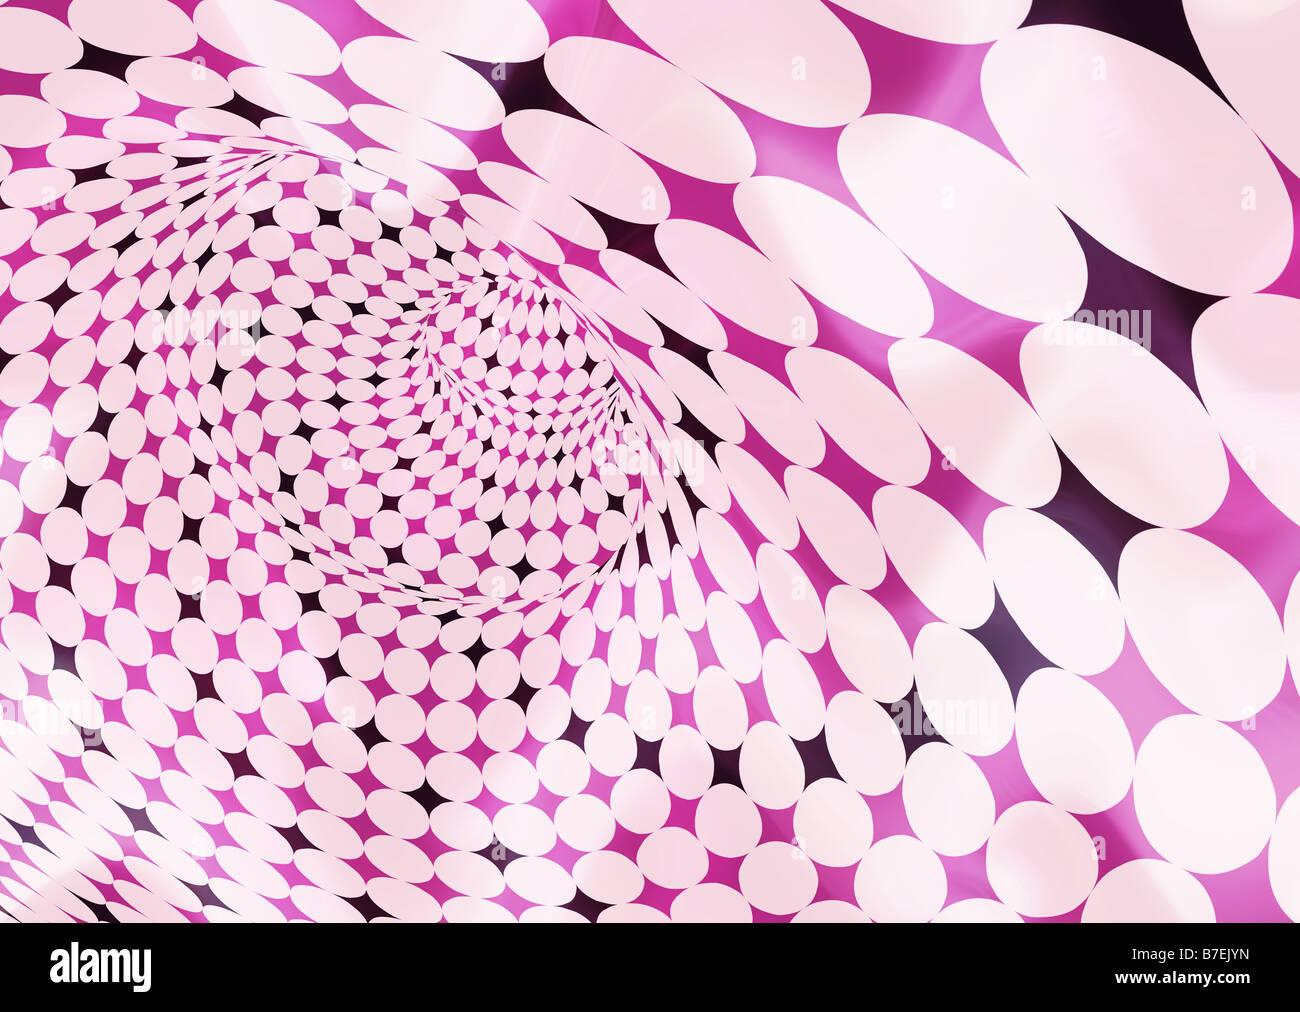 Image of Pop art (CG) - Stock Image